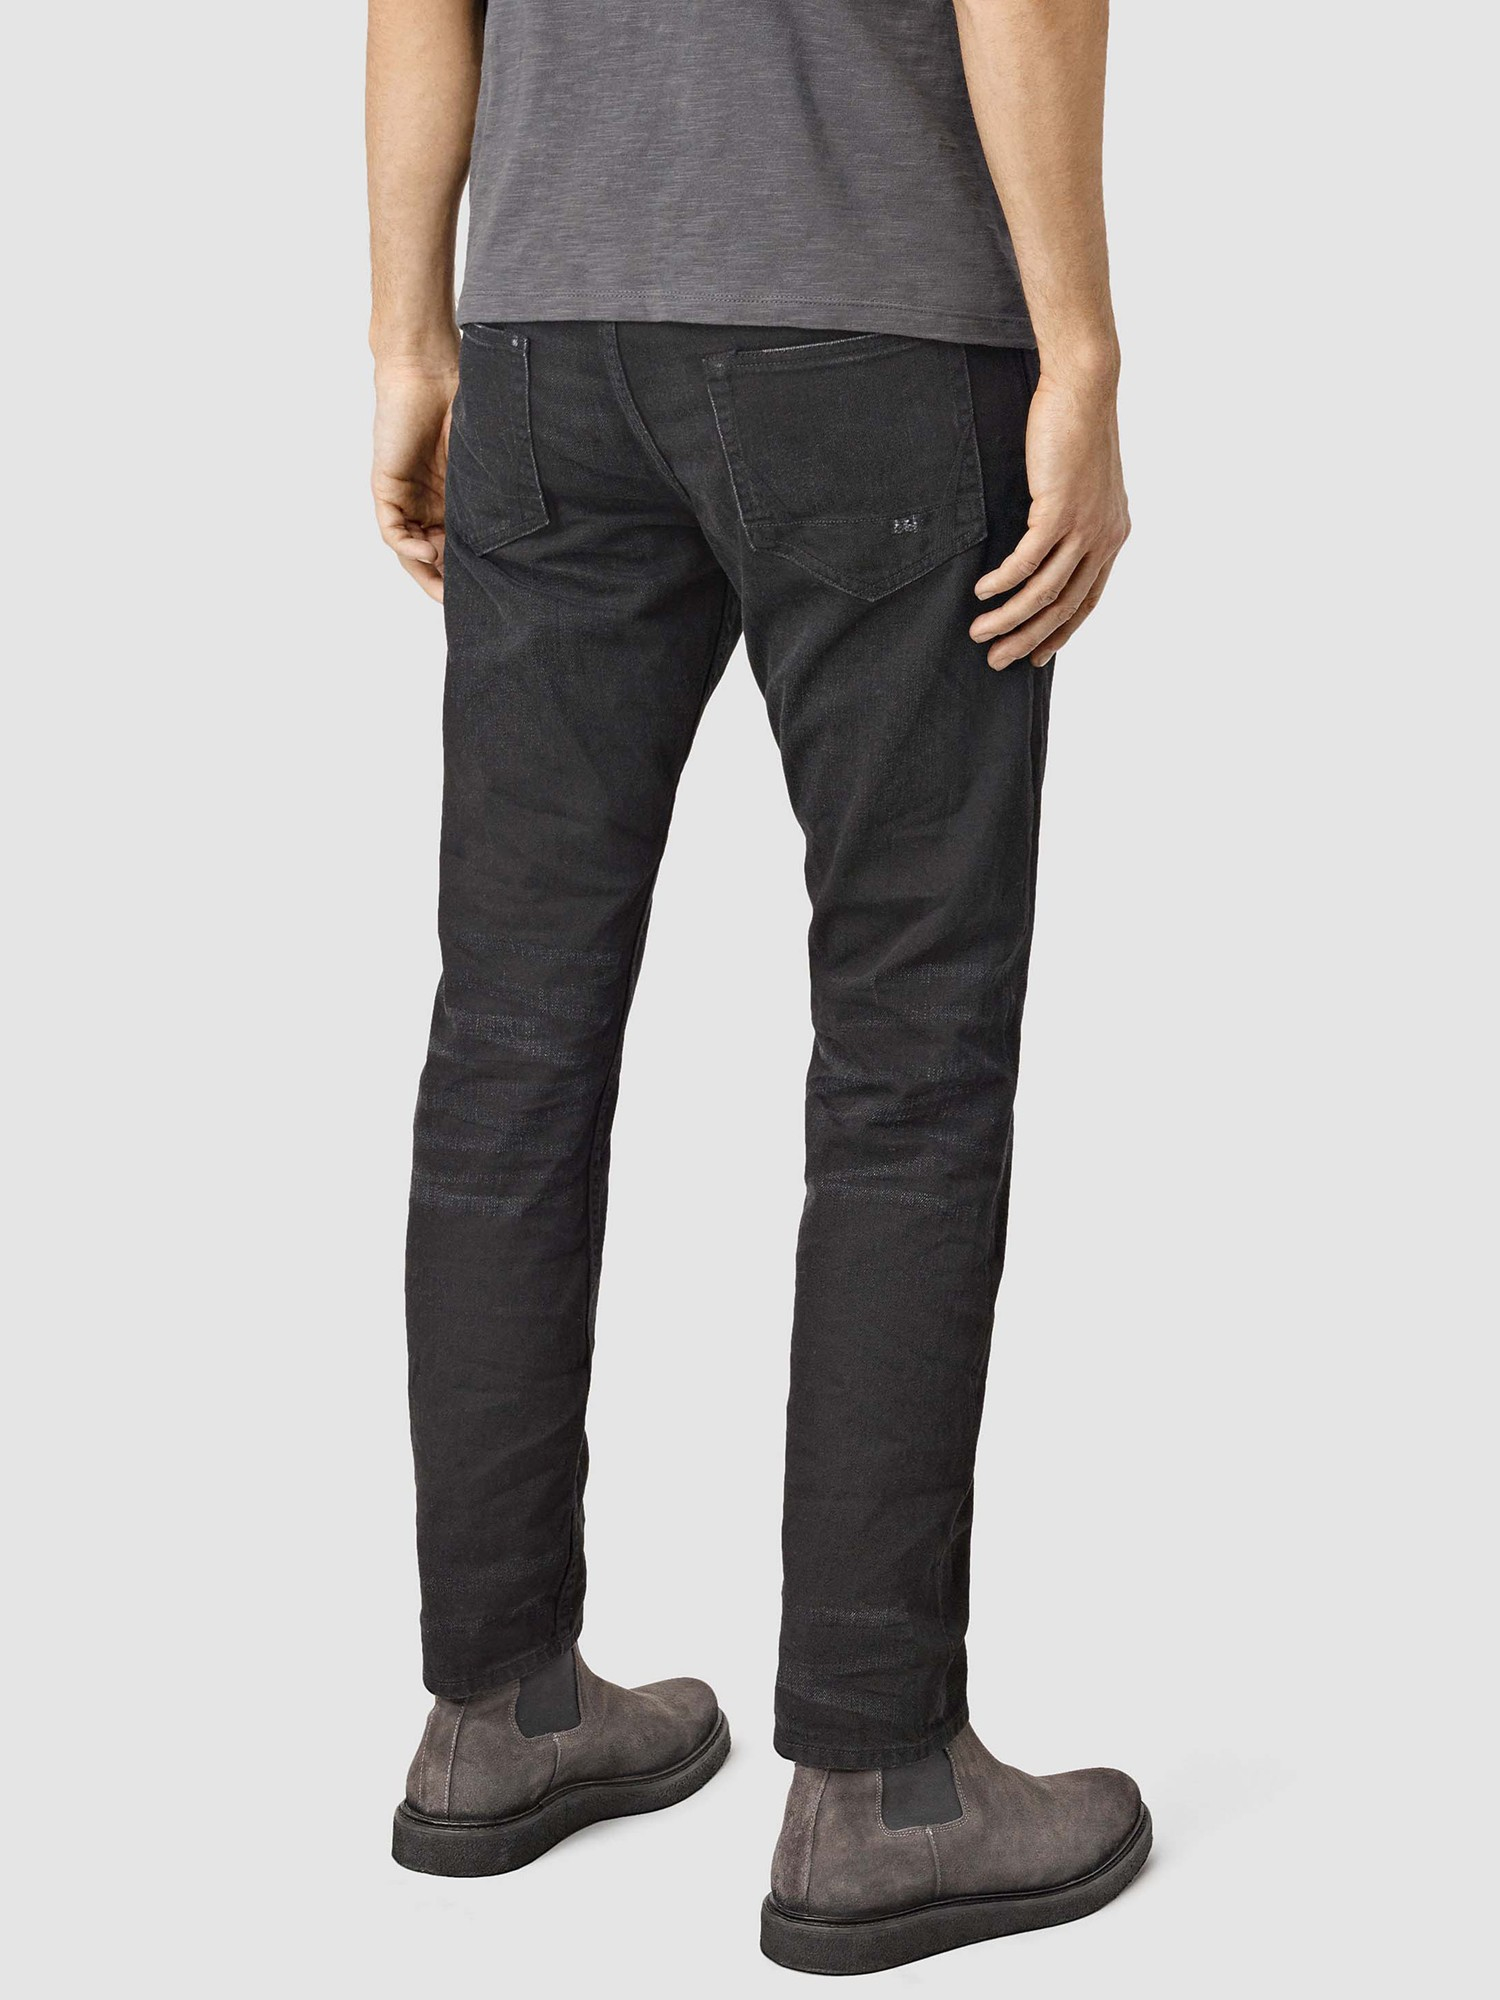 AllSaints Denim Kaneko Tapered Jeans in Black for Men